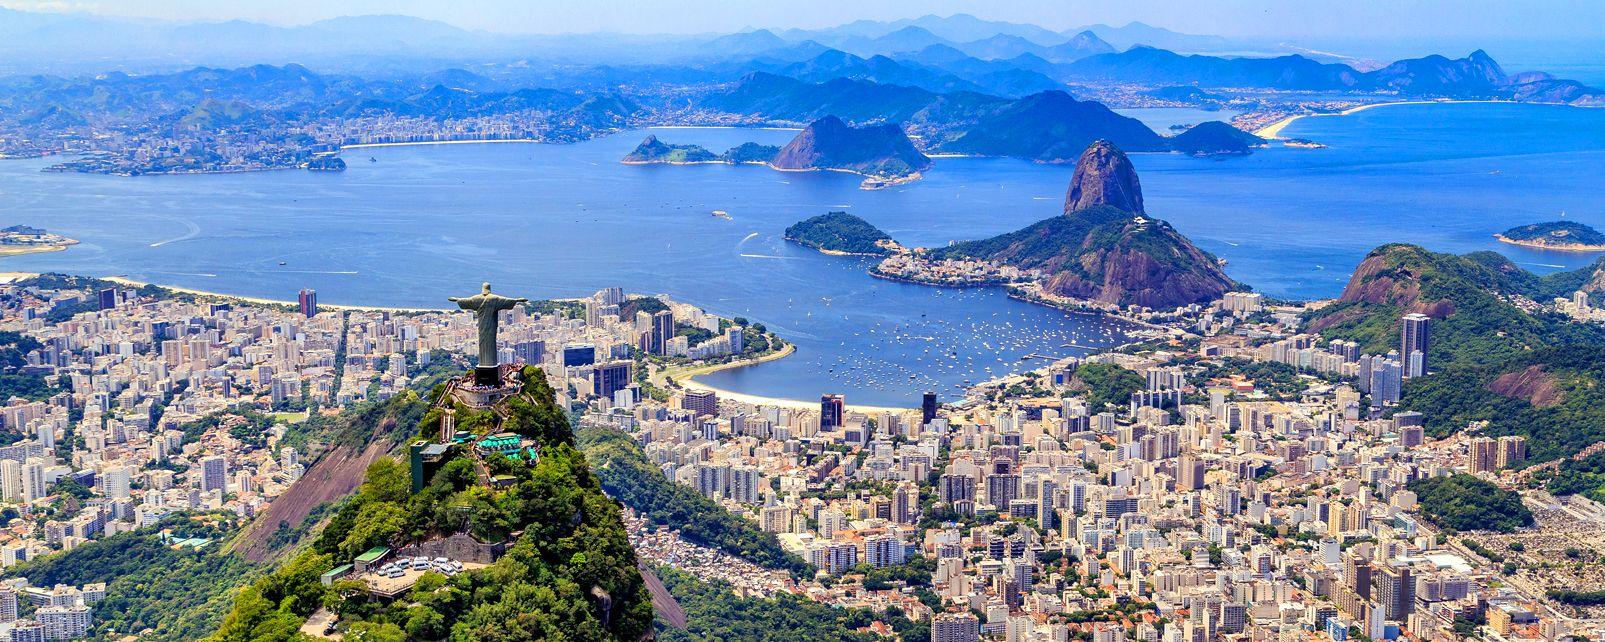 Vuelos Baratos a Rio de Janeiro desde Buenos Aires por ARS 7.024 finales